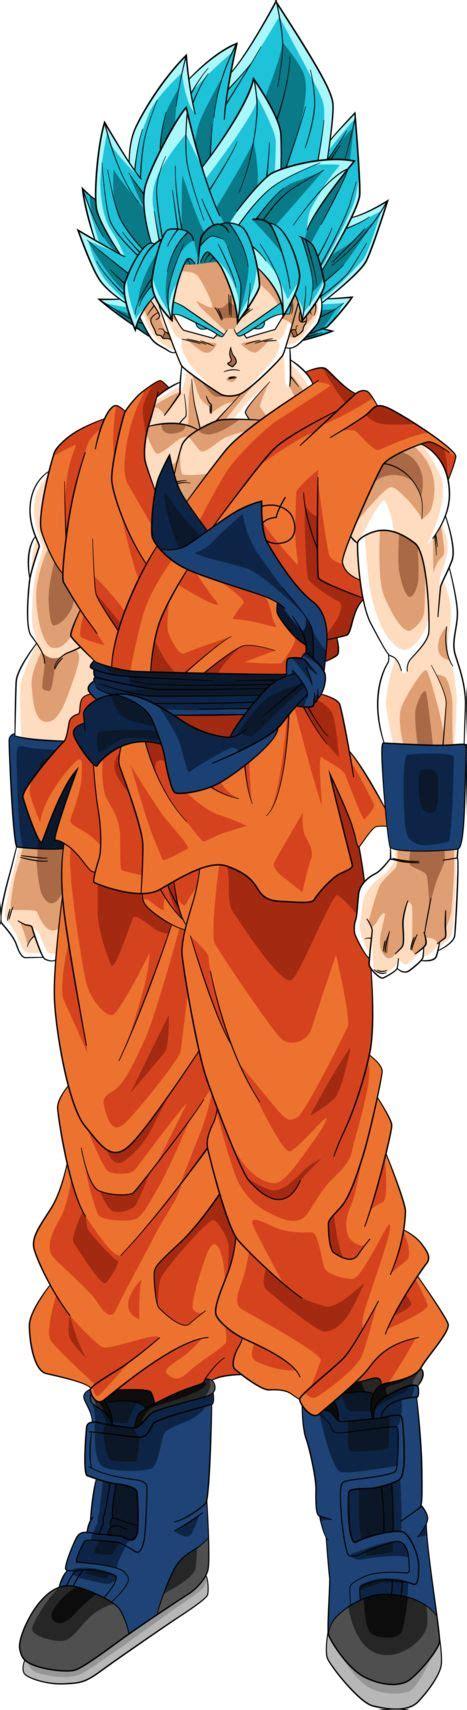 Goku Images Ssgss Goku Heroes Alt Palette By